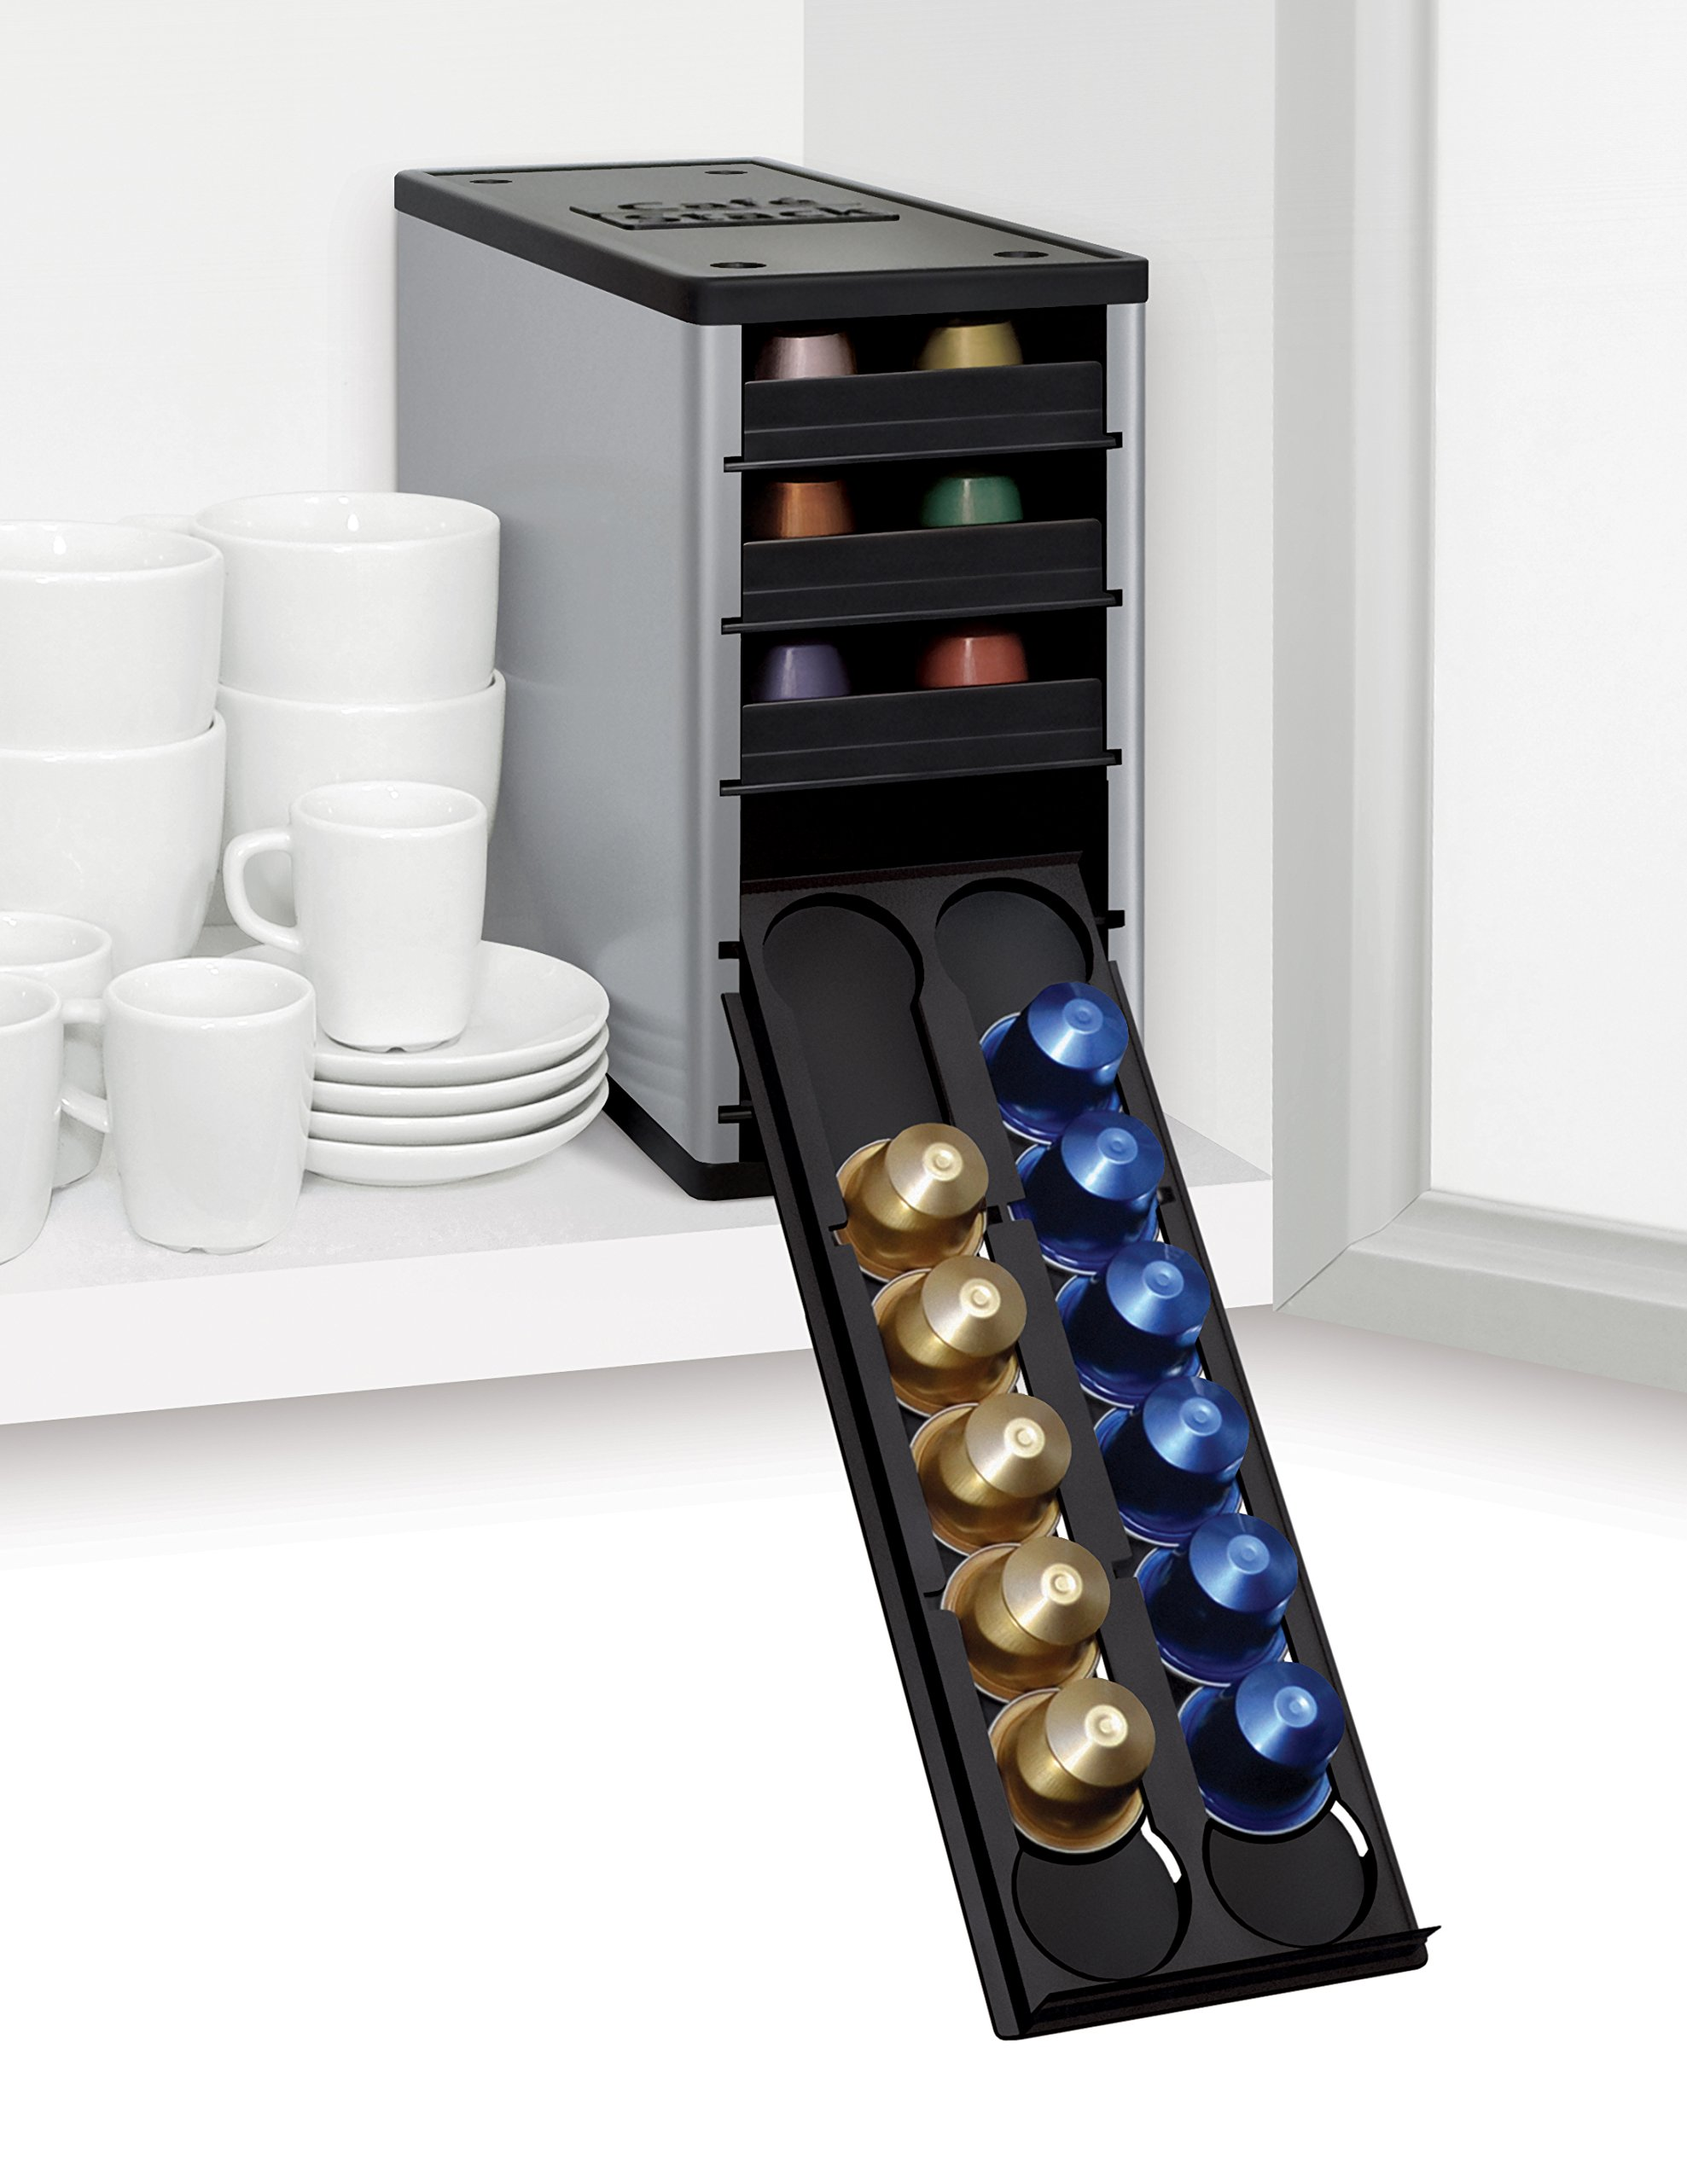 YouCopia CaféStack Nespresso Pod Storage Drawers Cabinet Organizer, 60 Capsules